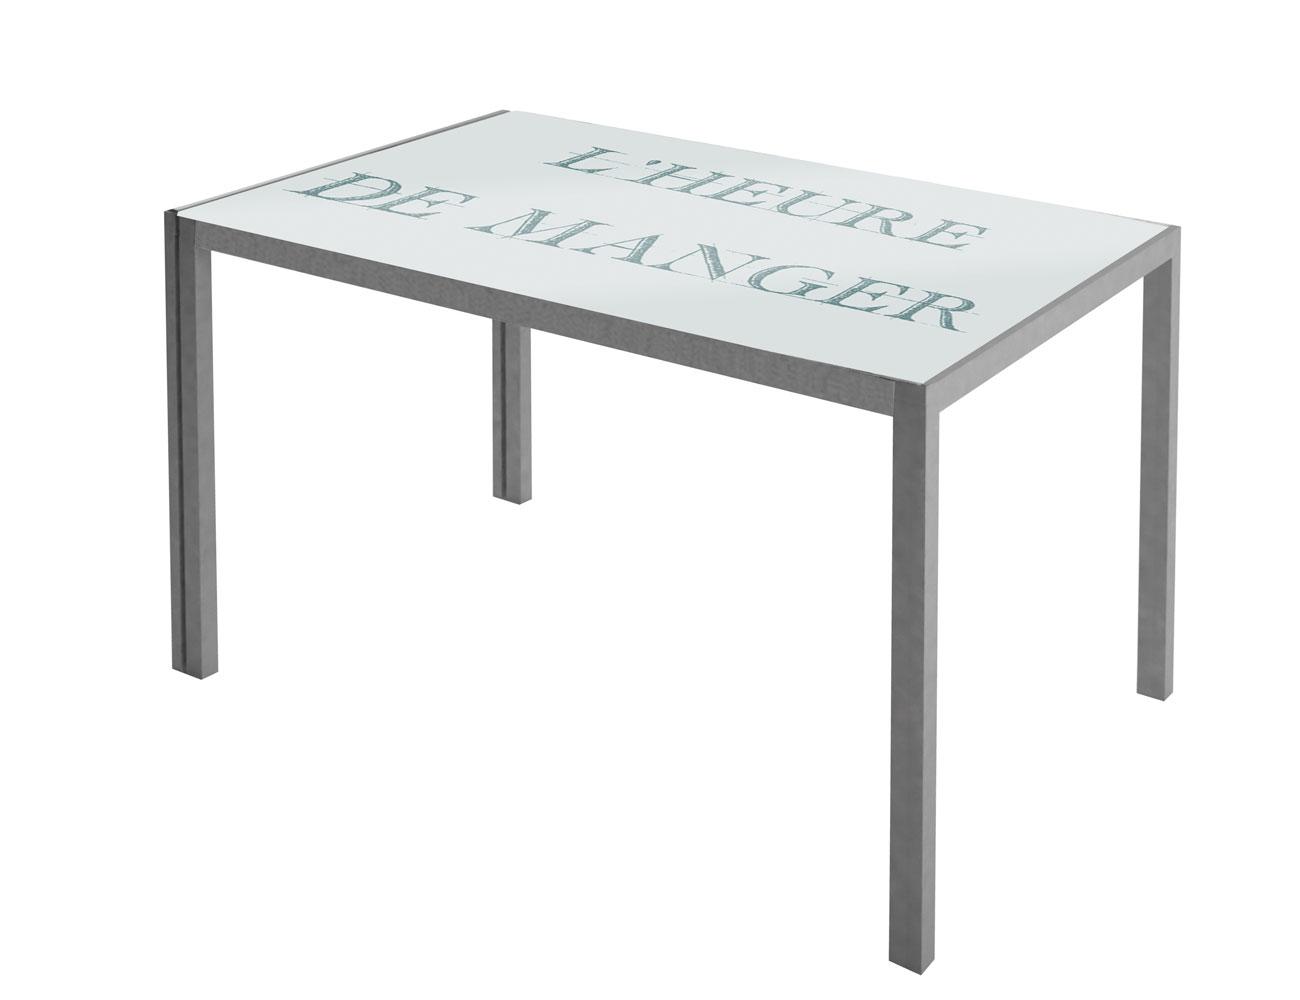 Mesa cocina cristal templado blanco 279